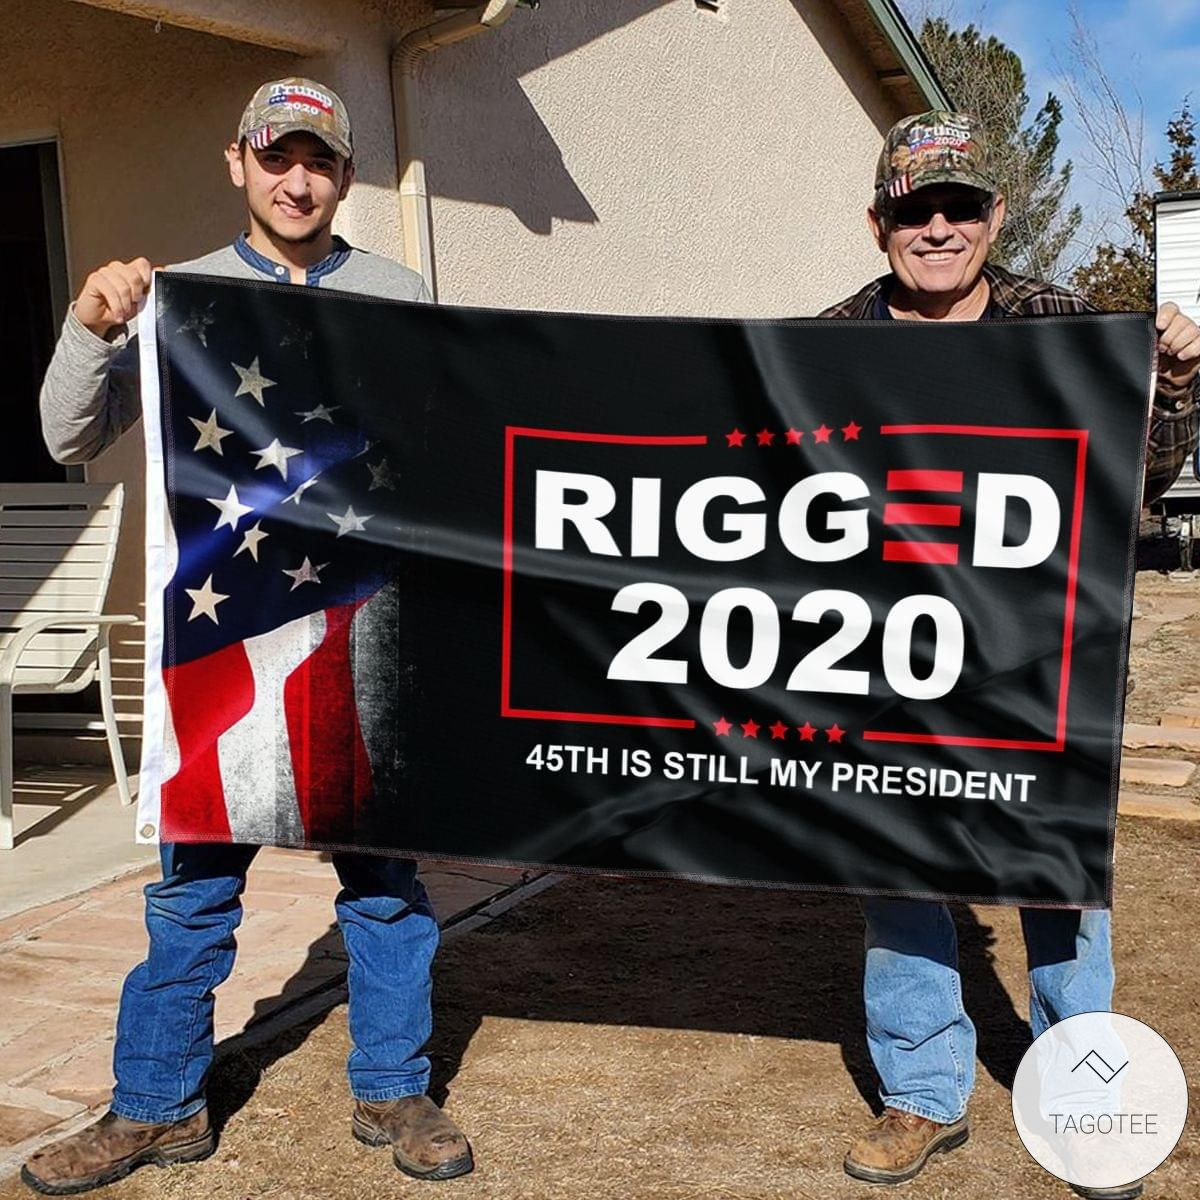 Rigged-2020-45th-Is-Still-My-President-Flag